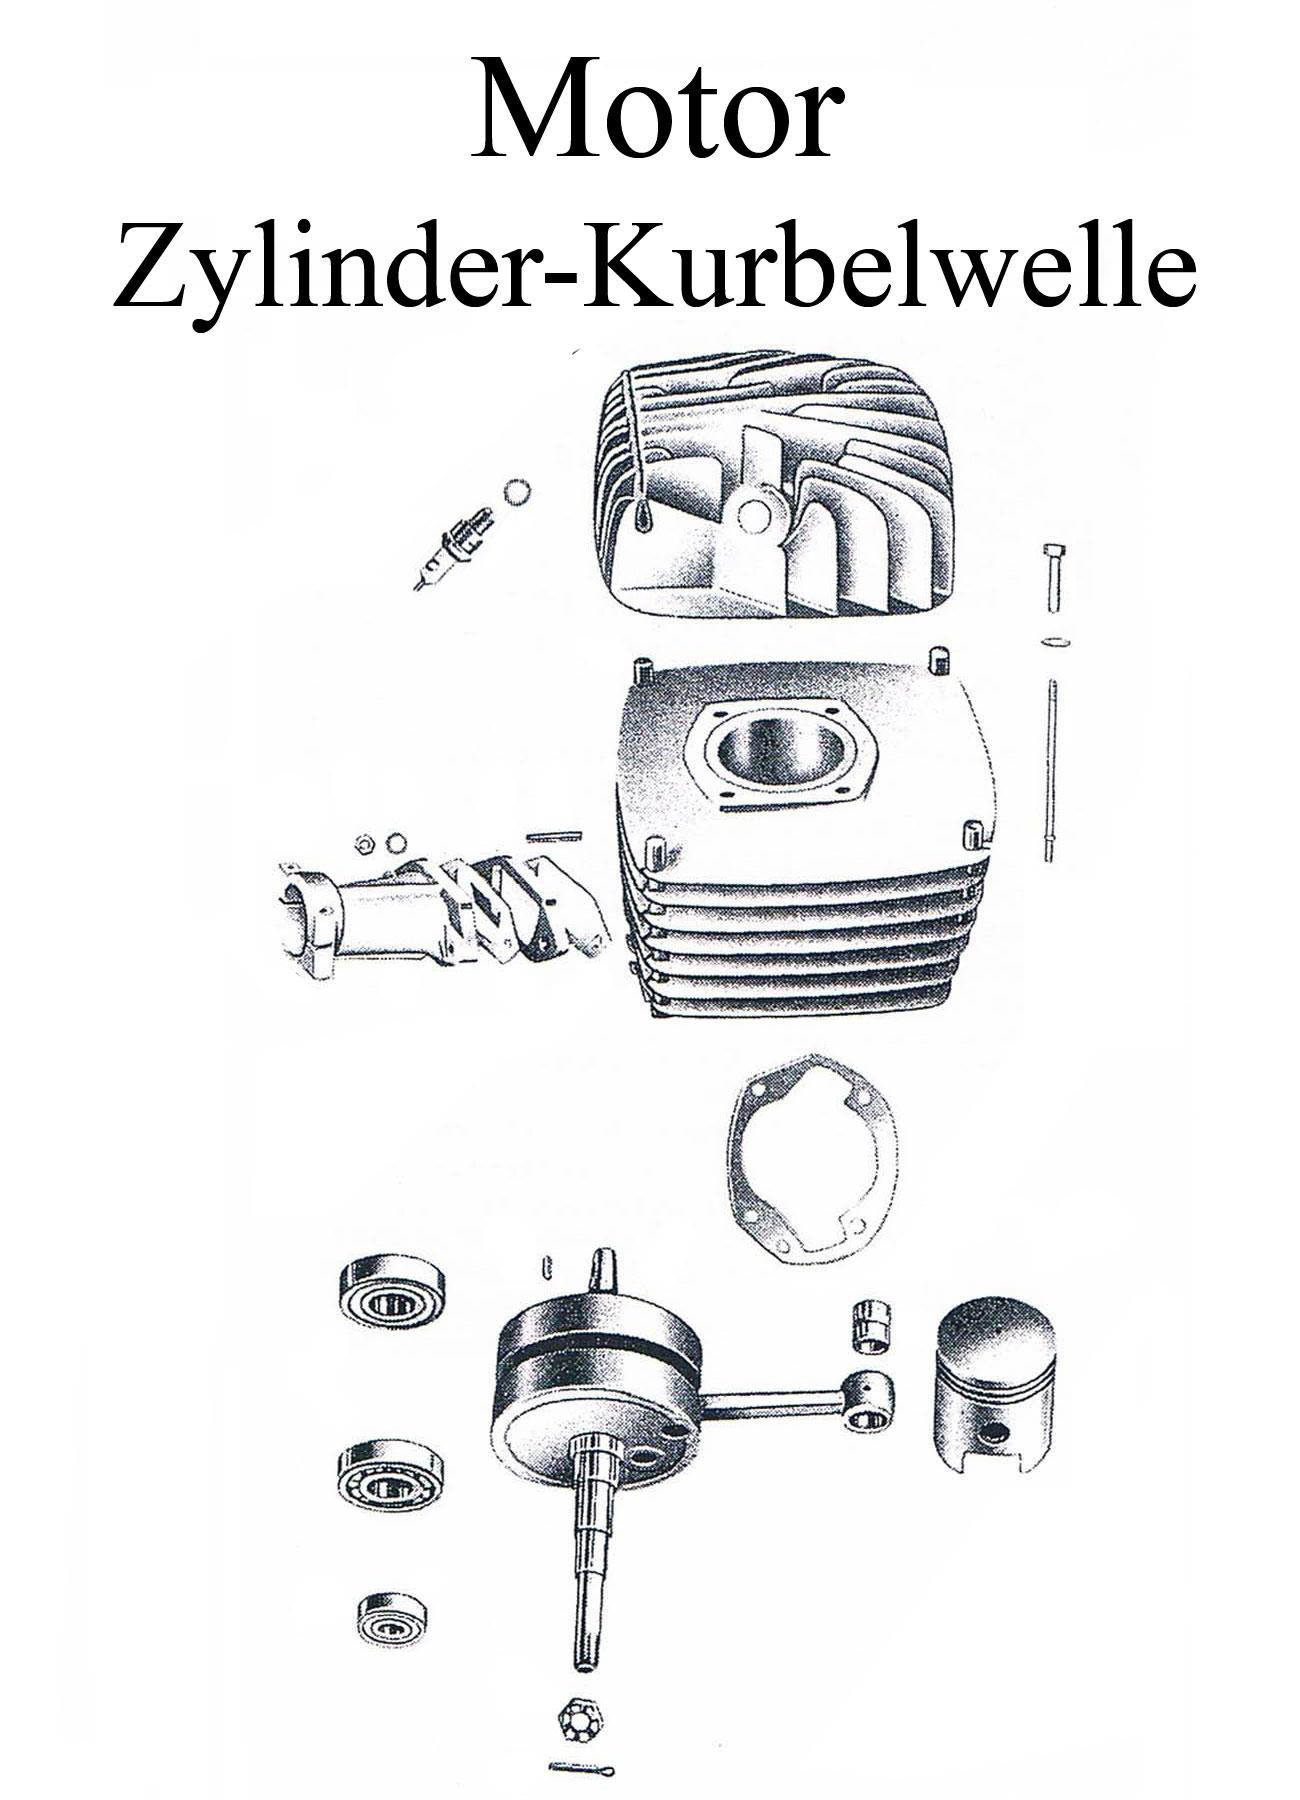 DDR-Motorrad MZ ES 175/2-250/2 Ersatzteileliste Motor Kurbelwelle Zylinderkopfdichtung Kolbenbolzen Lager Wellendichtringe